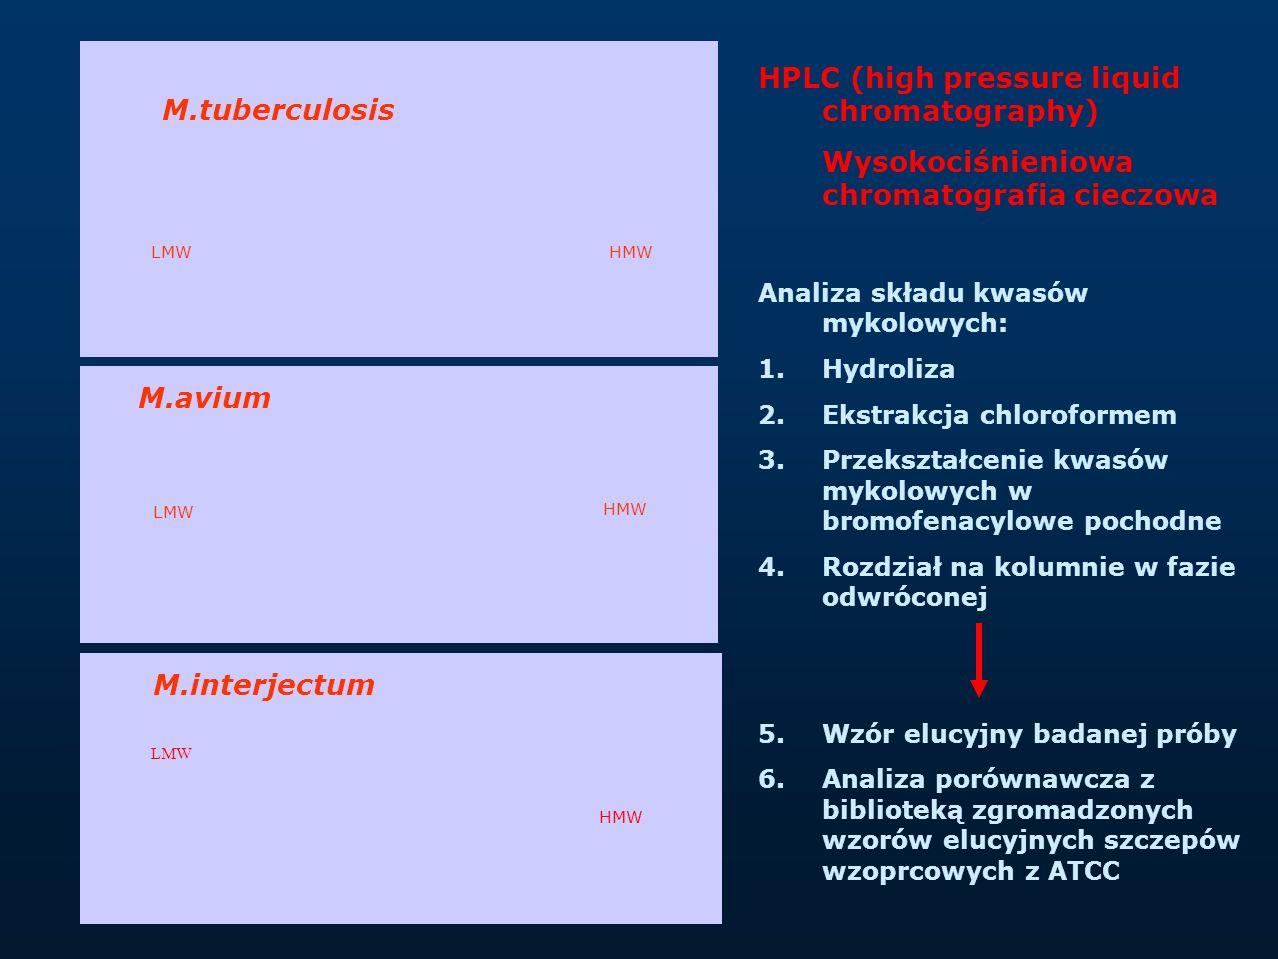 HPLC (high pressure liquid chromatography)